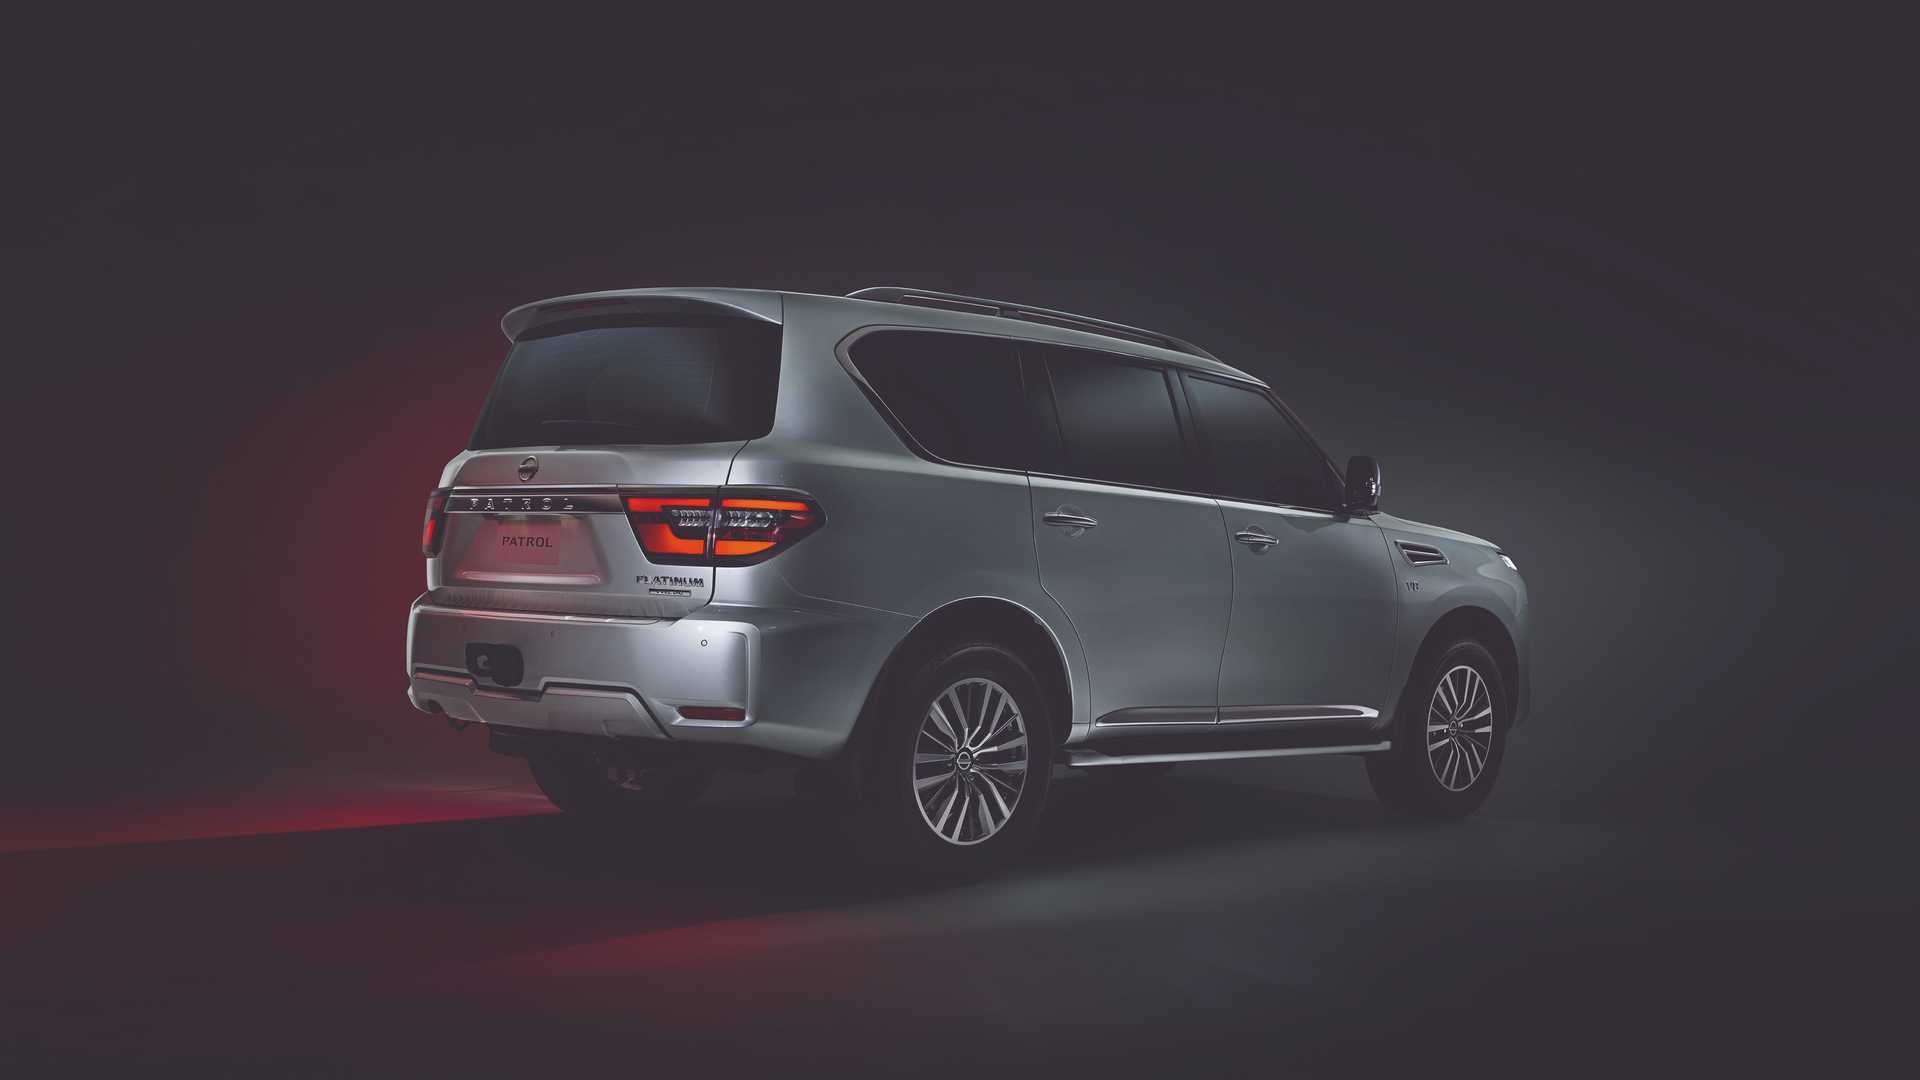 2020 Nissan Patrol Review